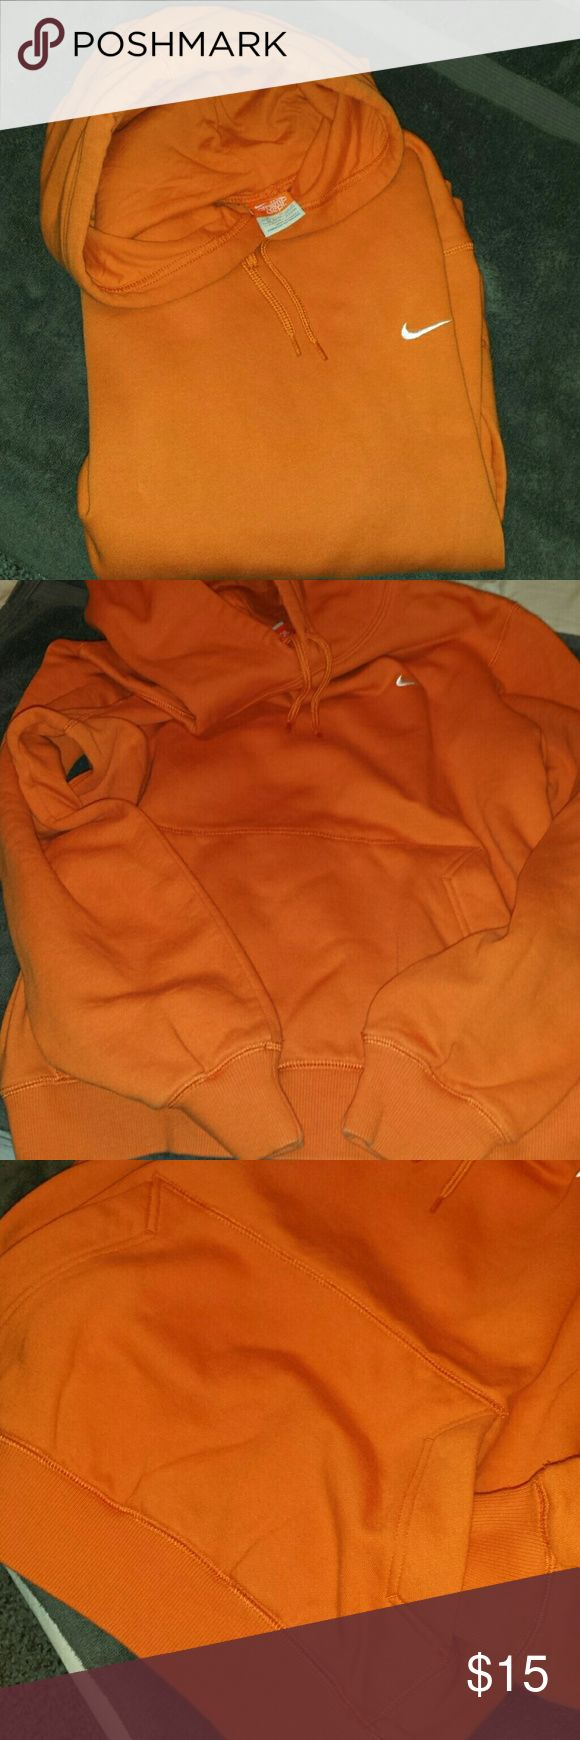 NIKE Hoodie Orange. No stain  Unisex hoodie Medium for women Small for boys/ XS for men Nike Tops Sweatshirts & Hoodies